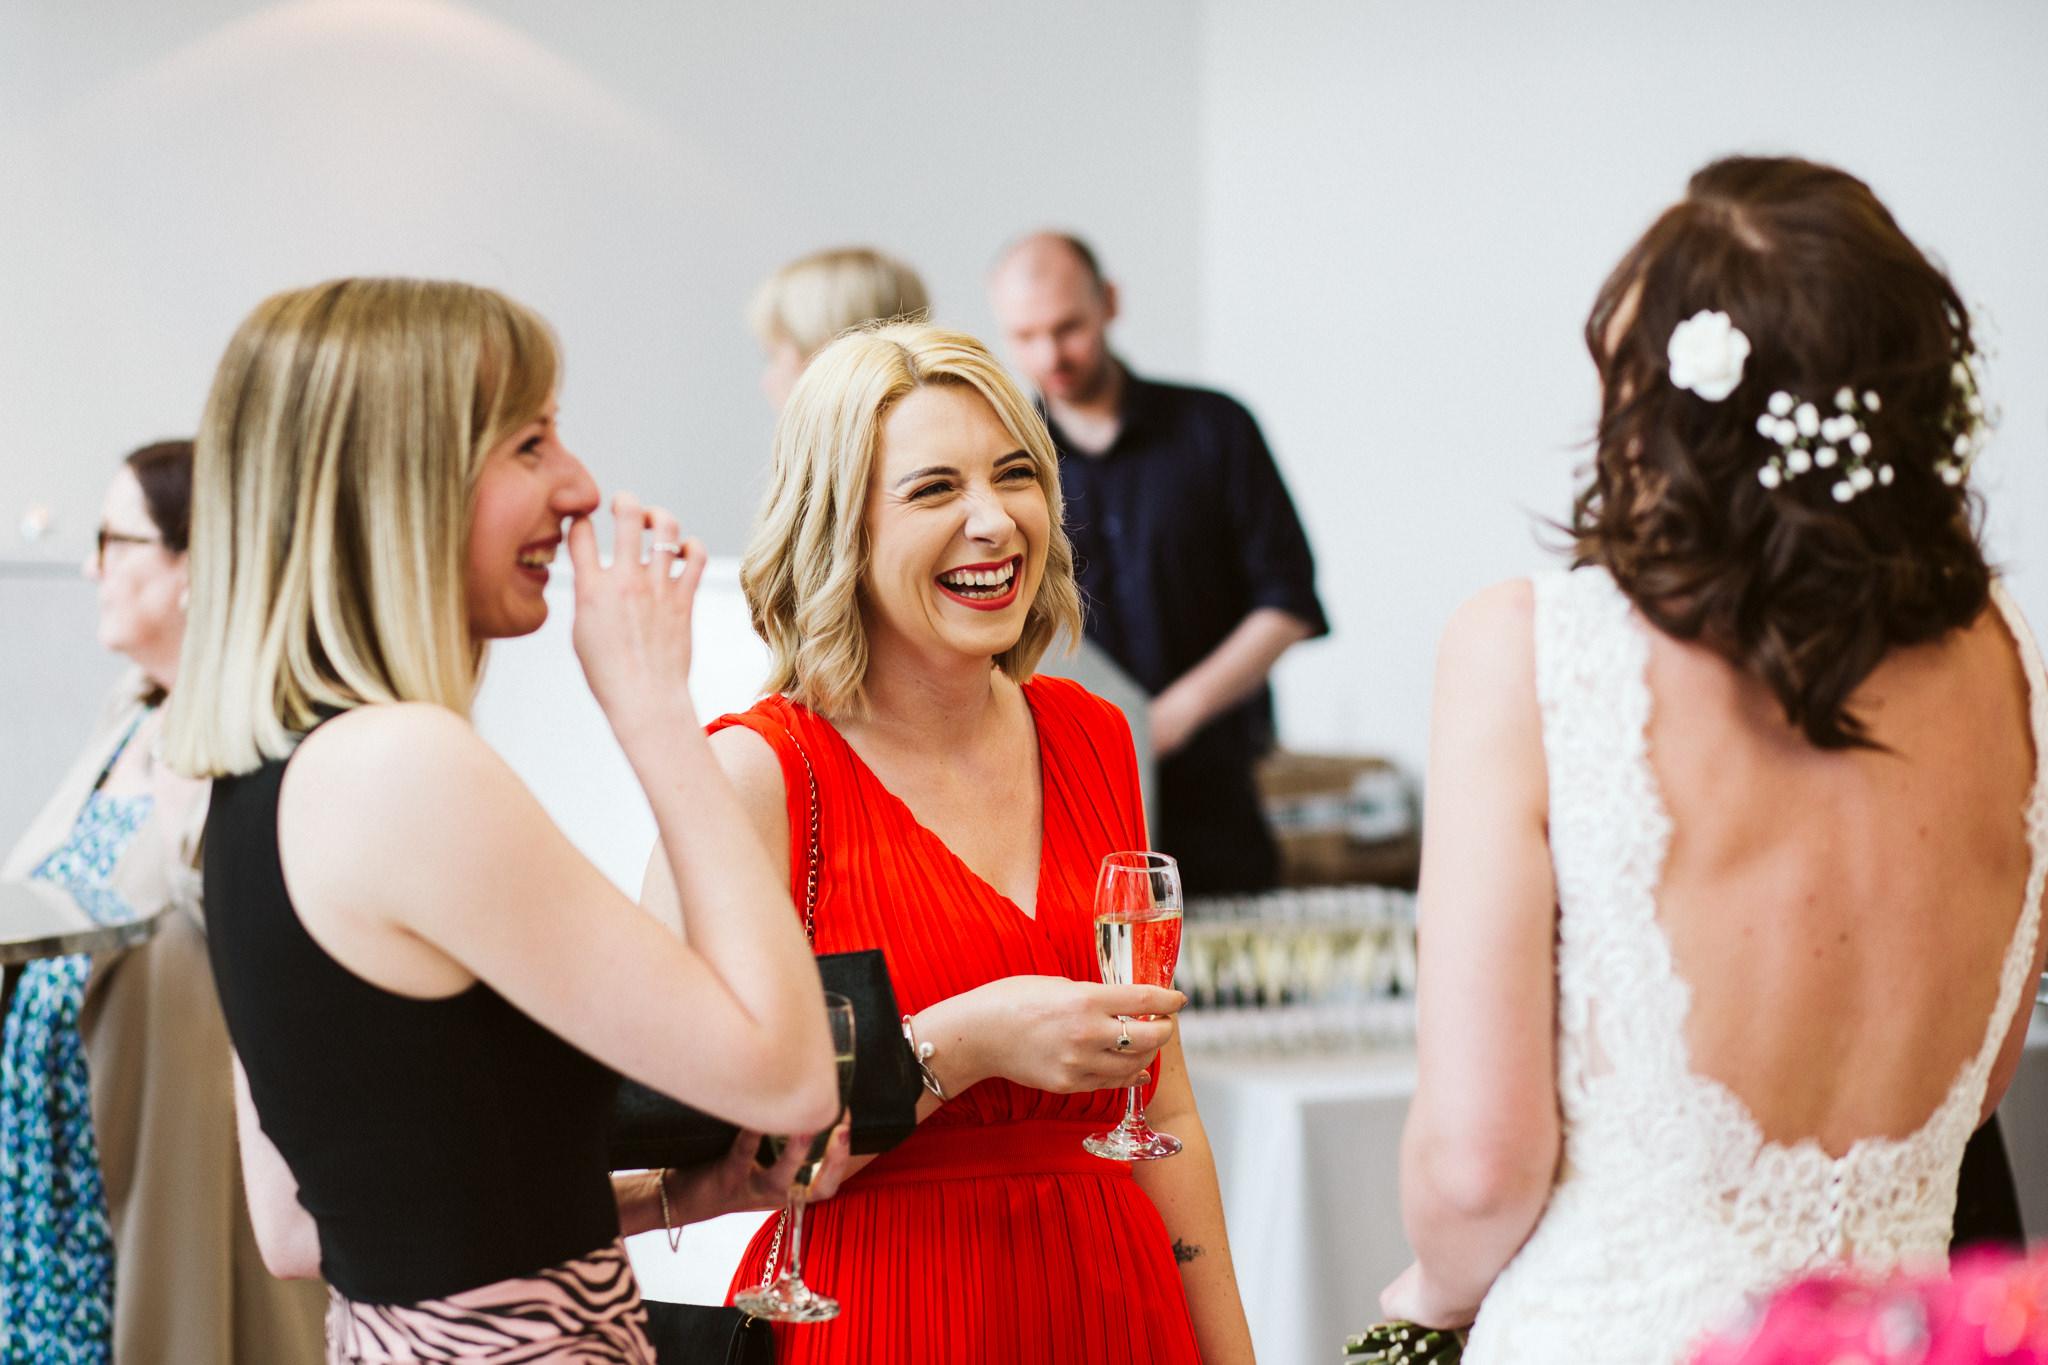 baltic-wedding-margarita-hope (34).jpg